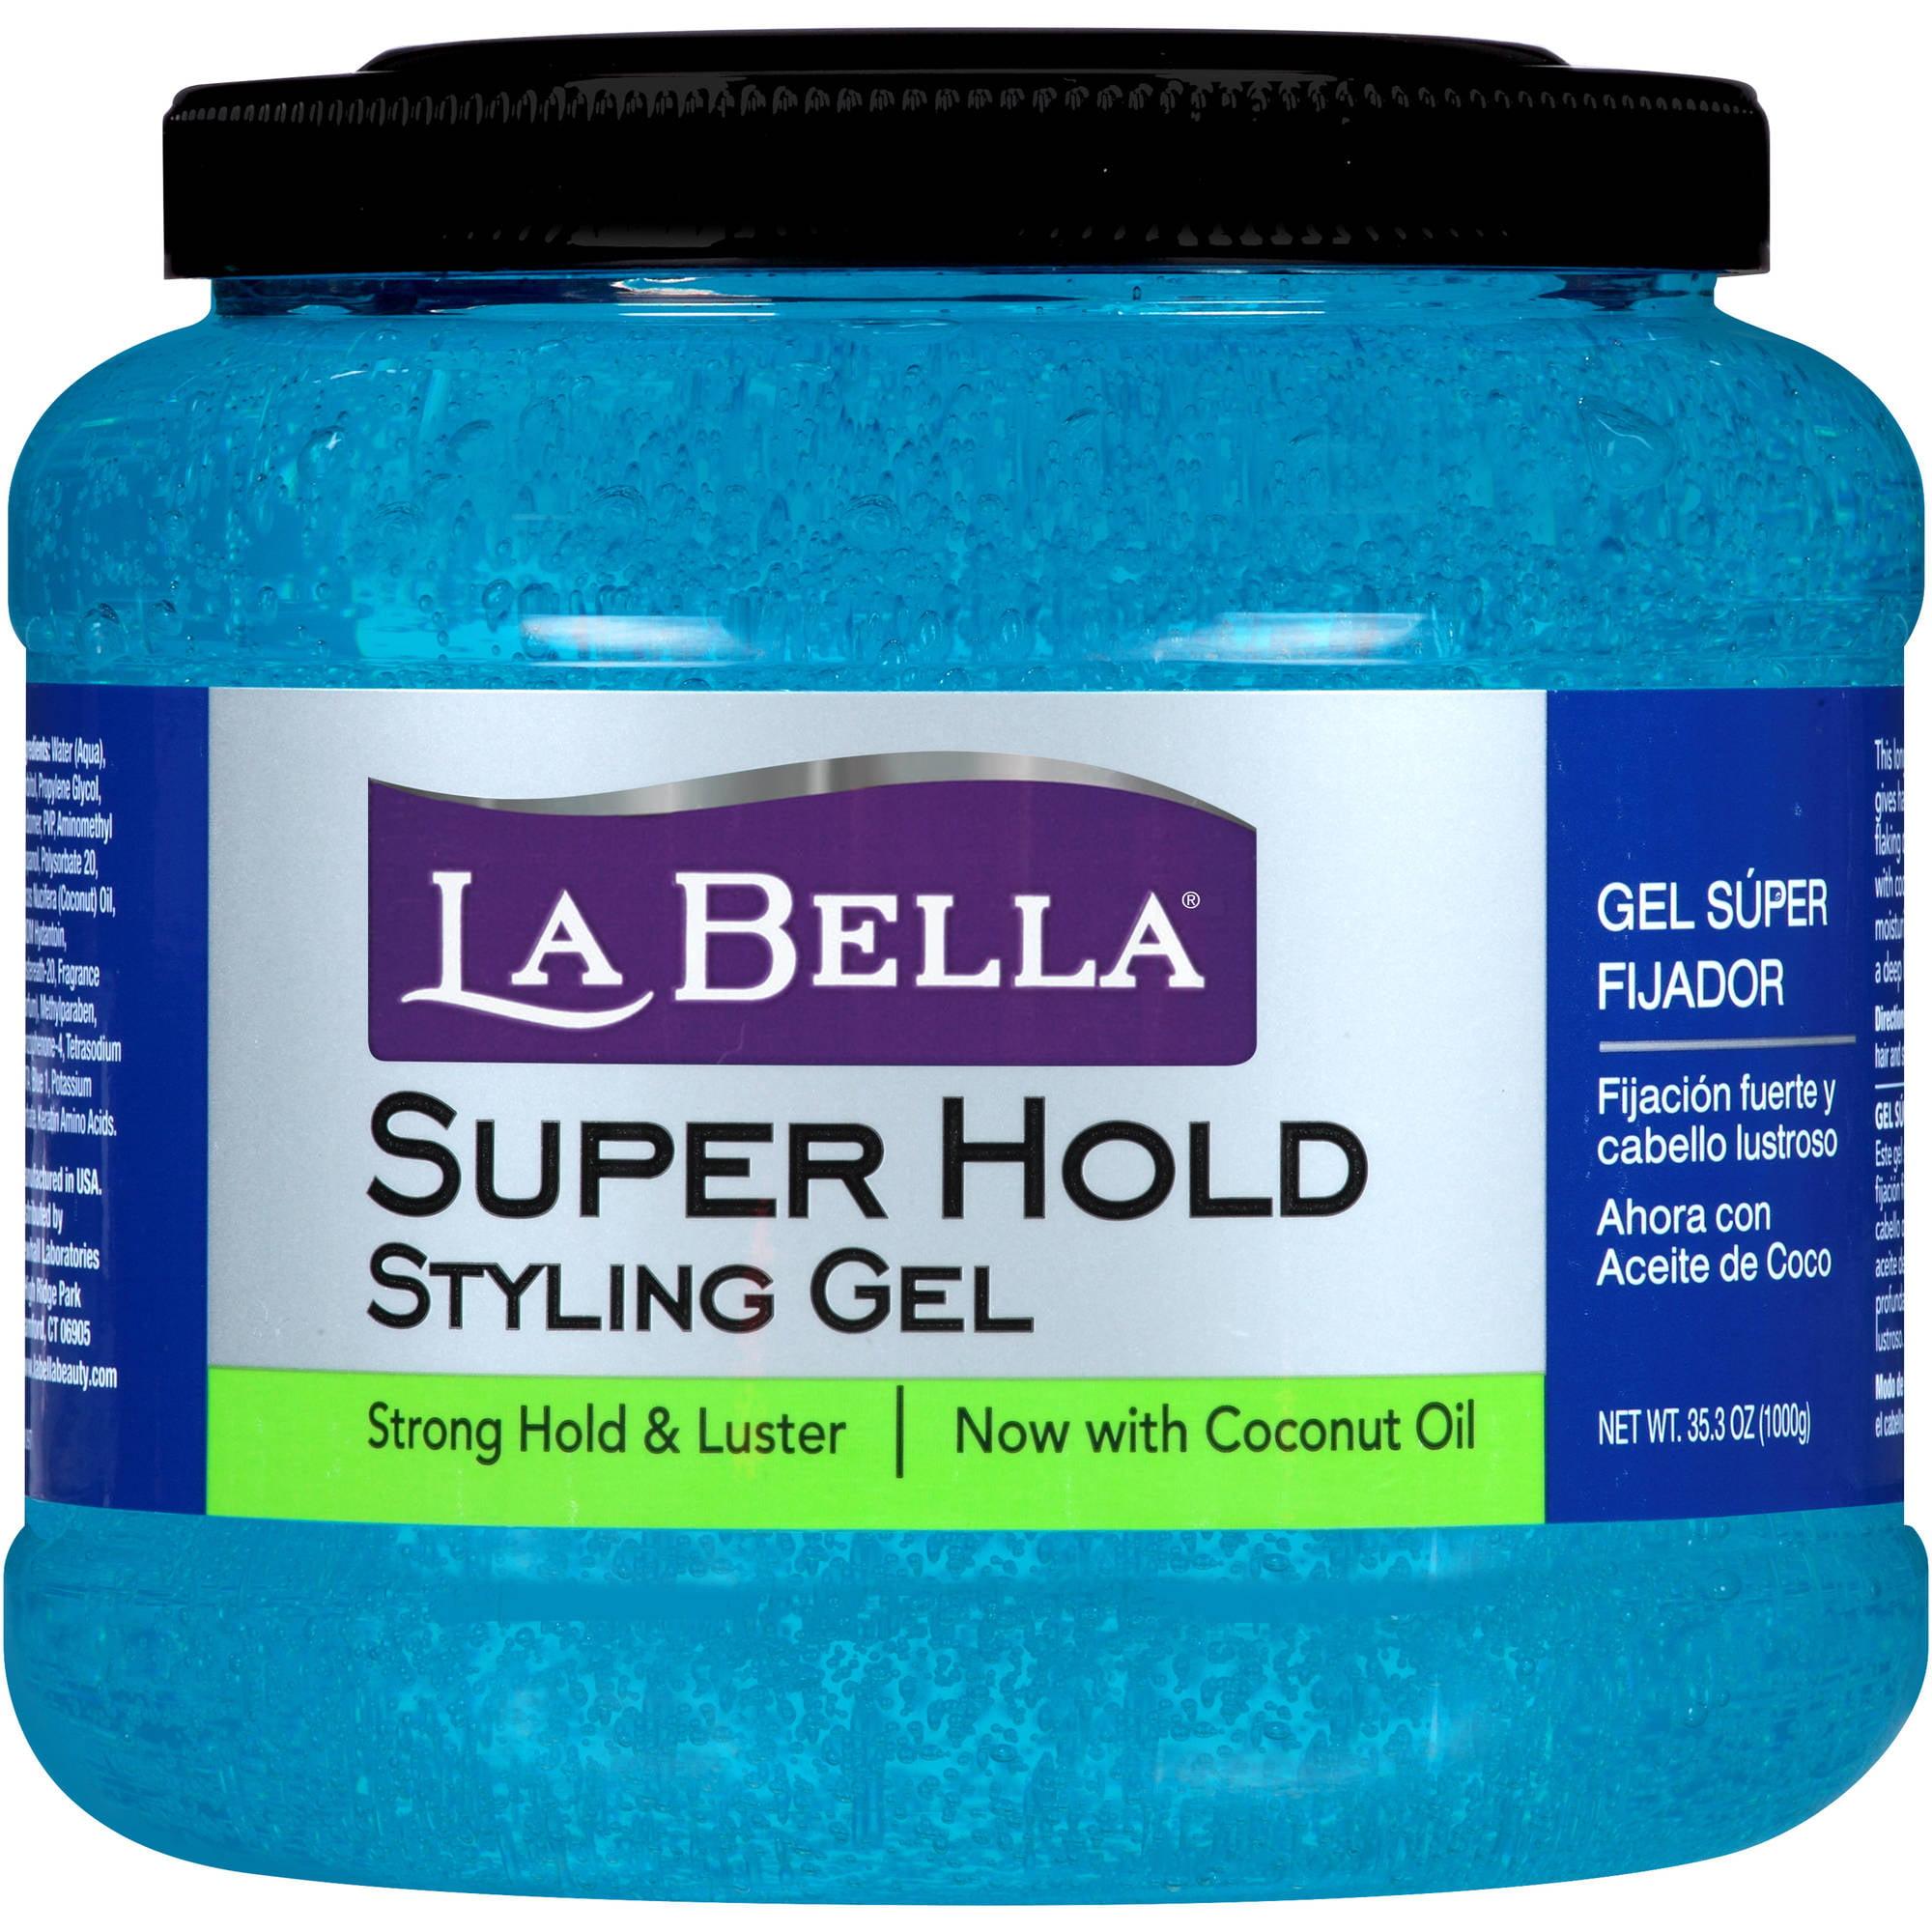 La Bella Super Hold Styling Gel, 35.3 oz